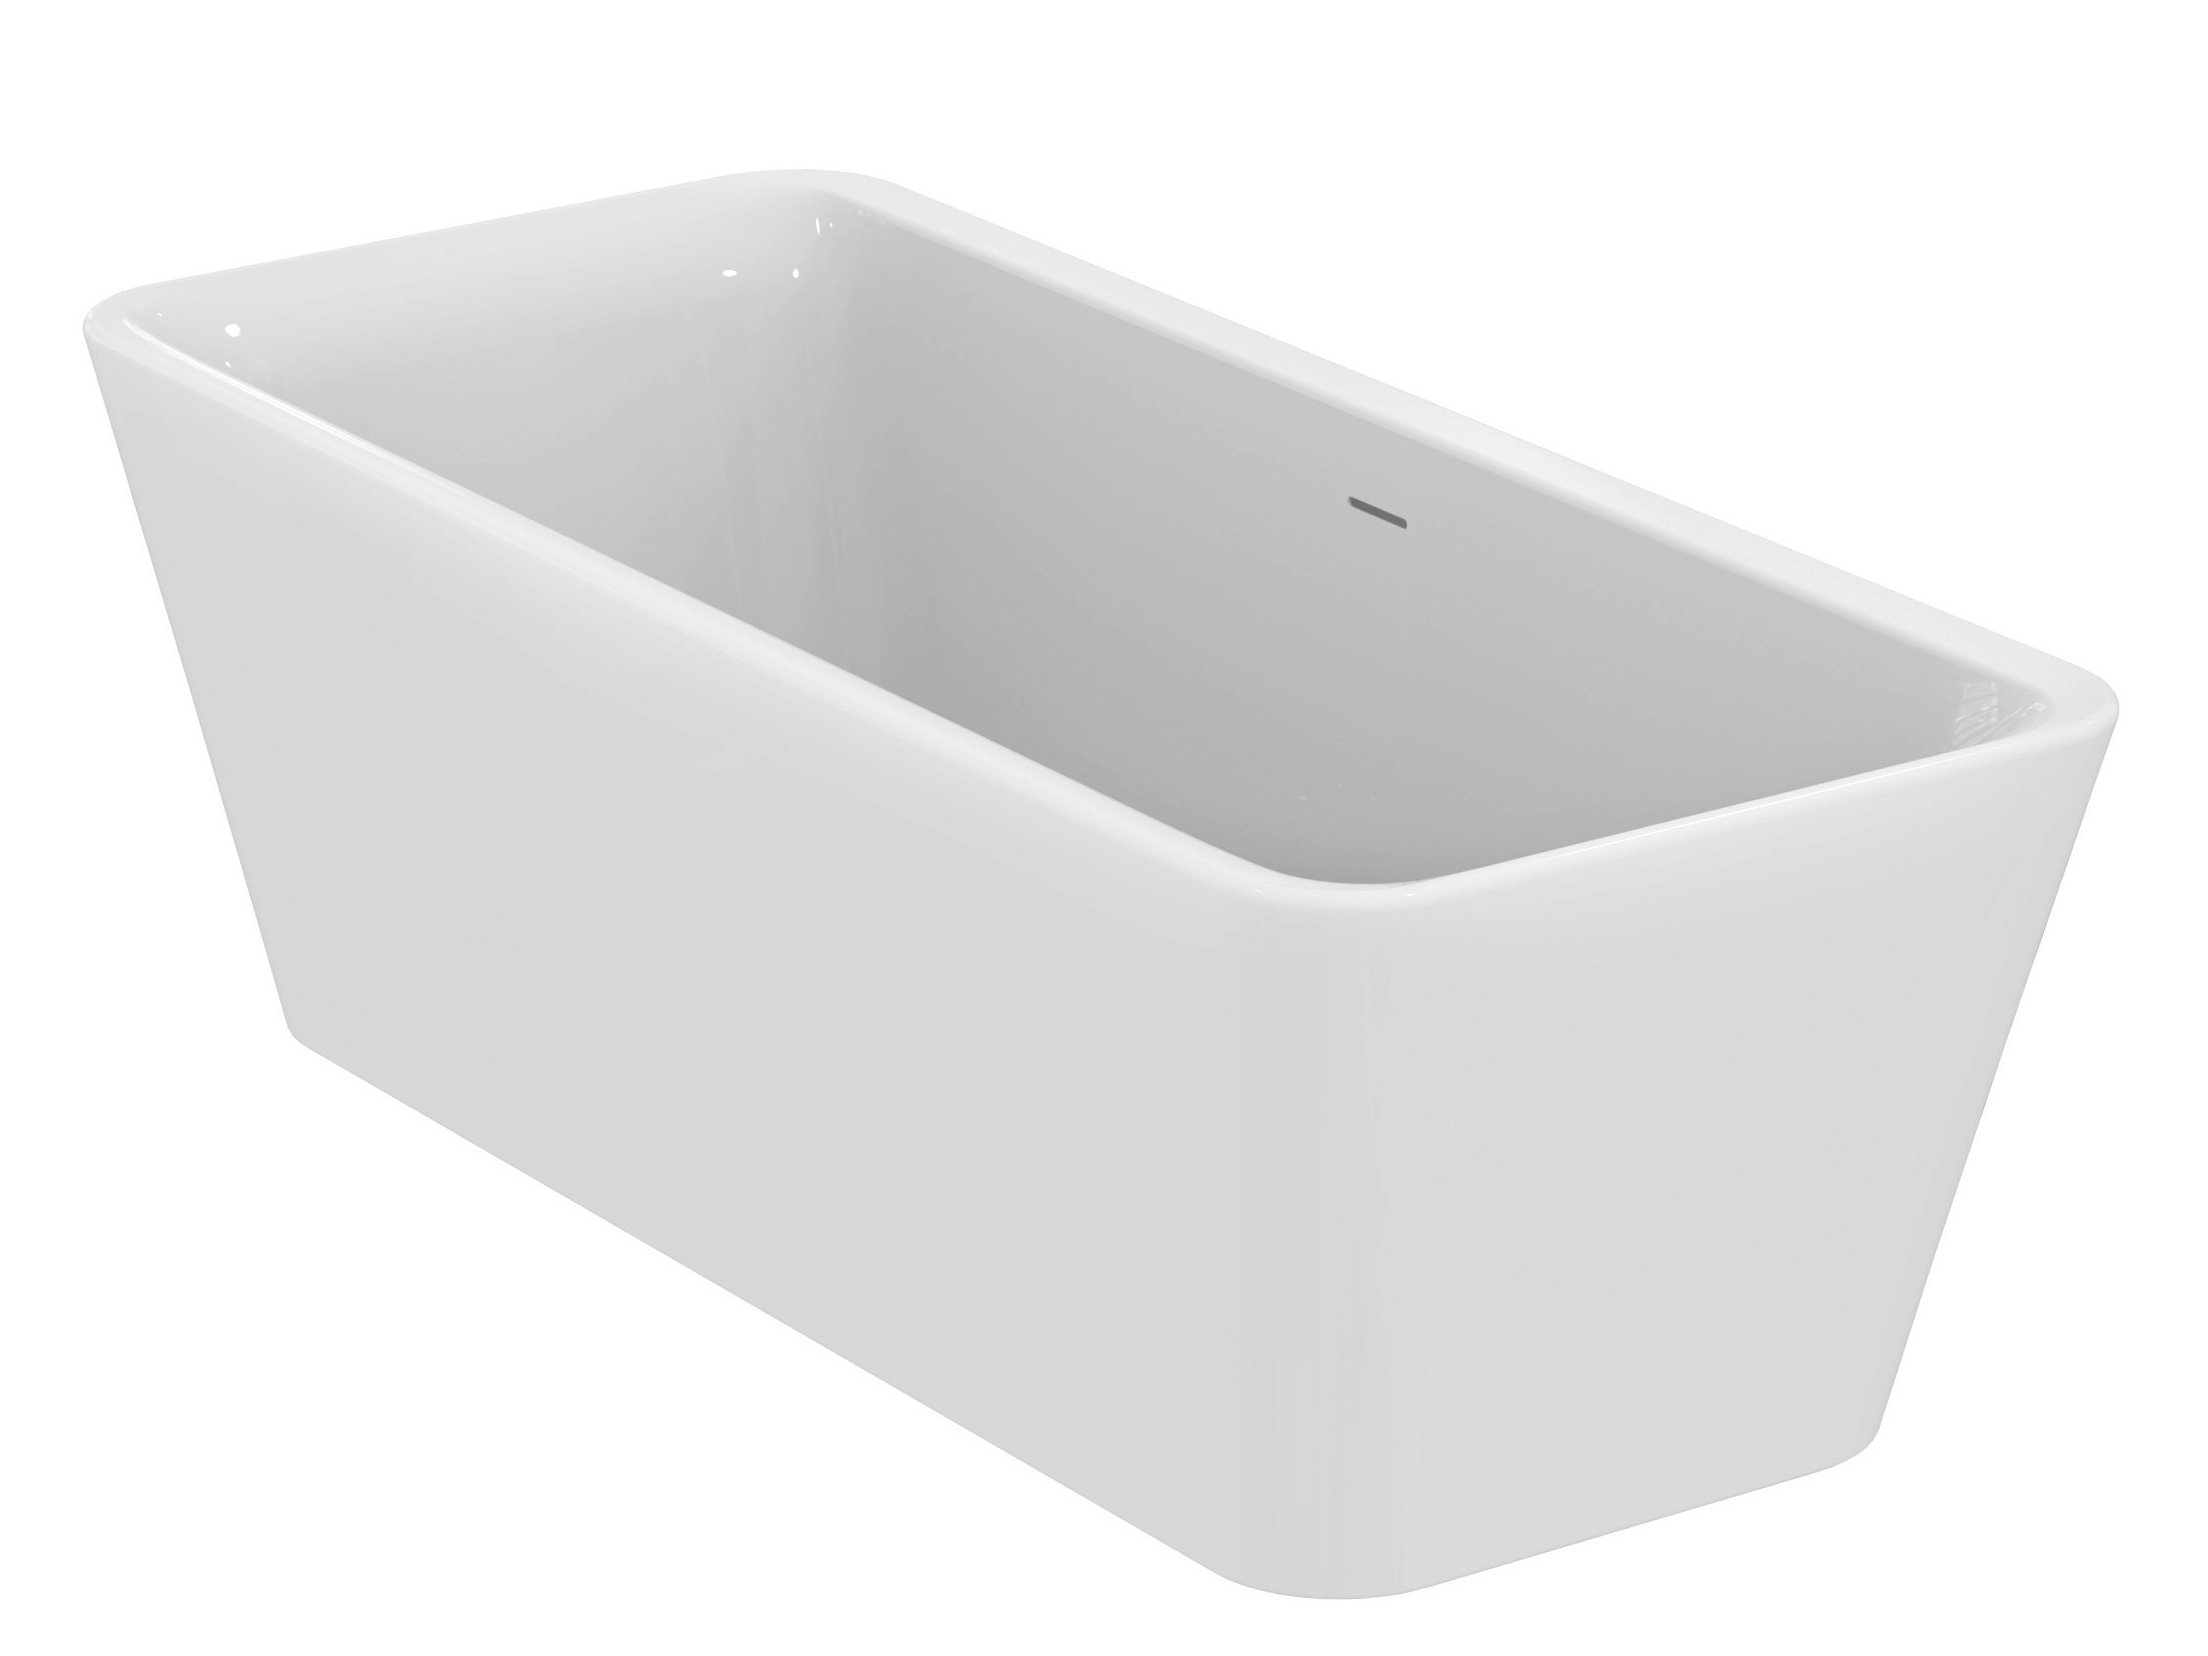 Vasche da bagno | Vasche e docce | Archiproducts